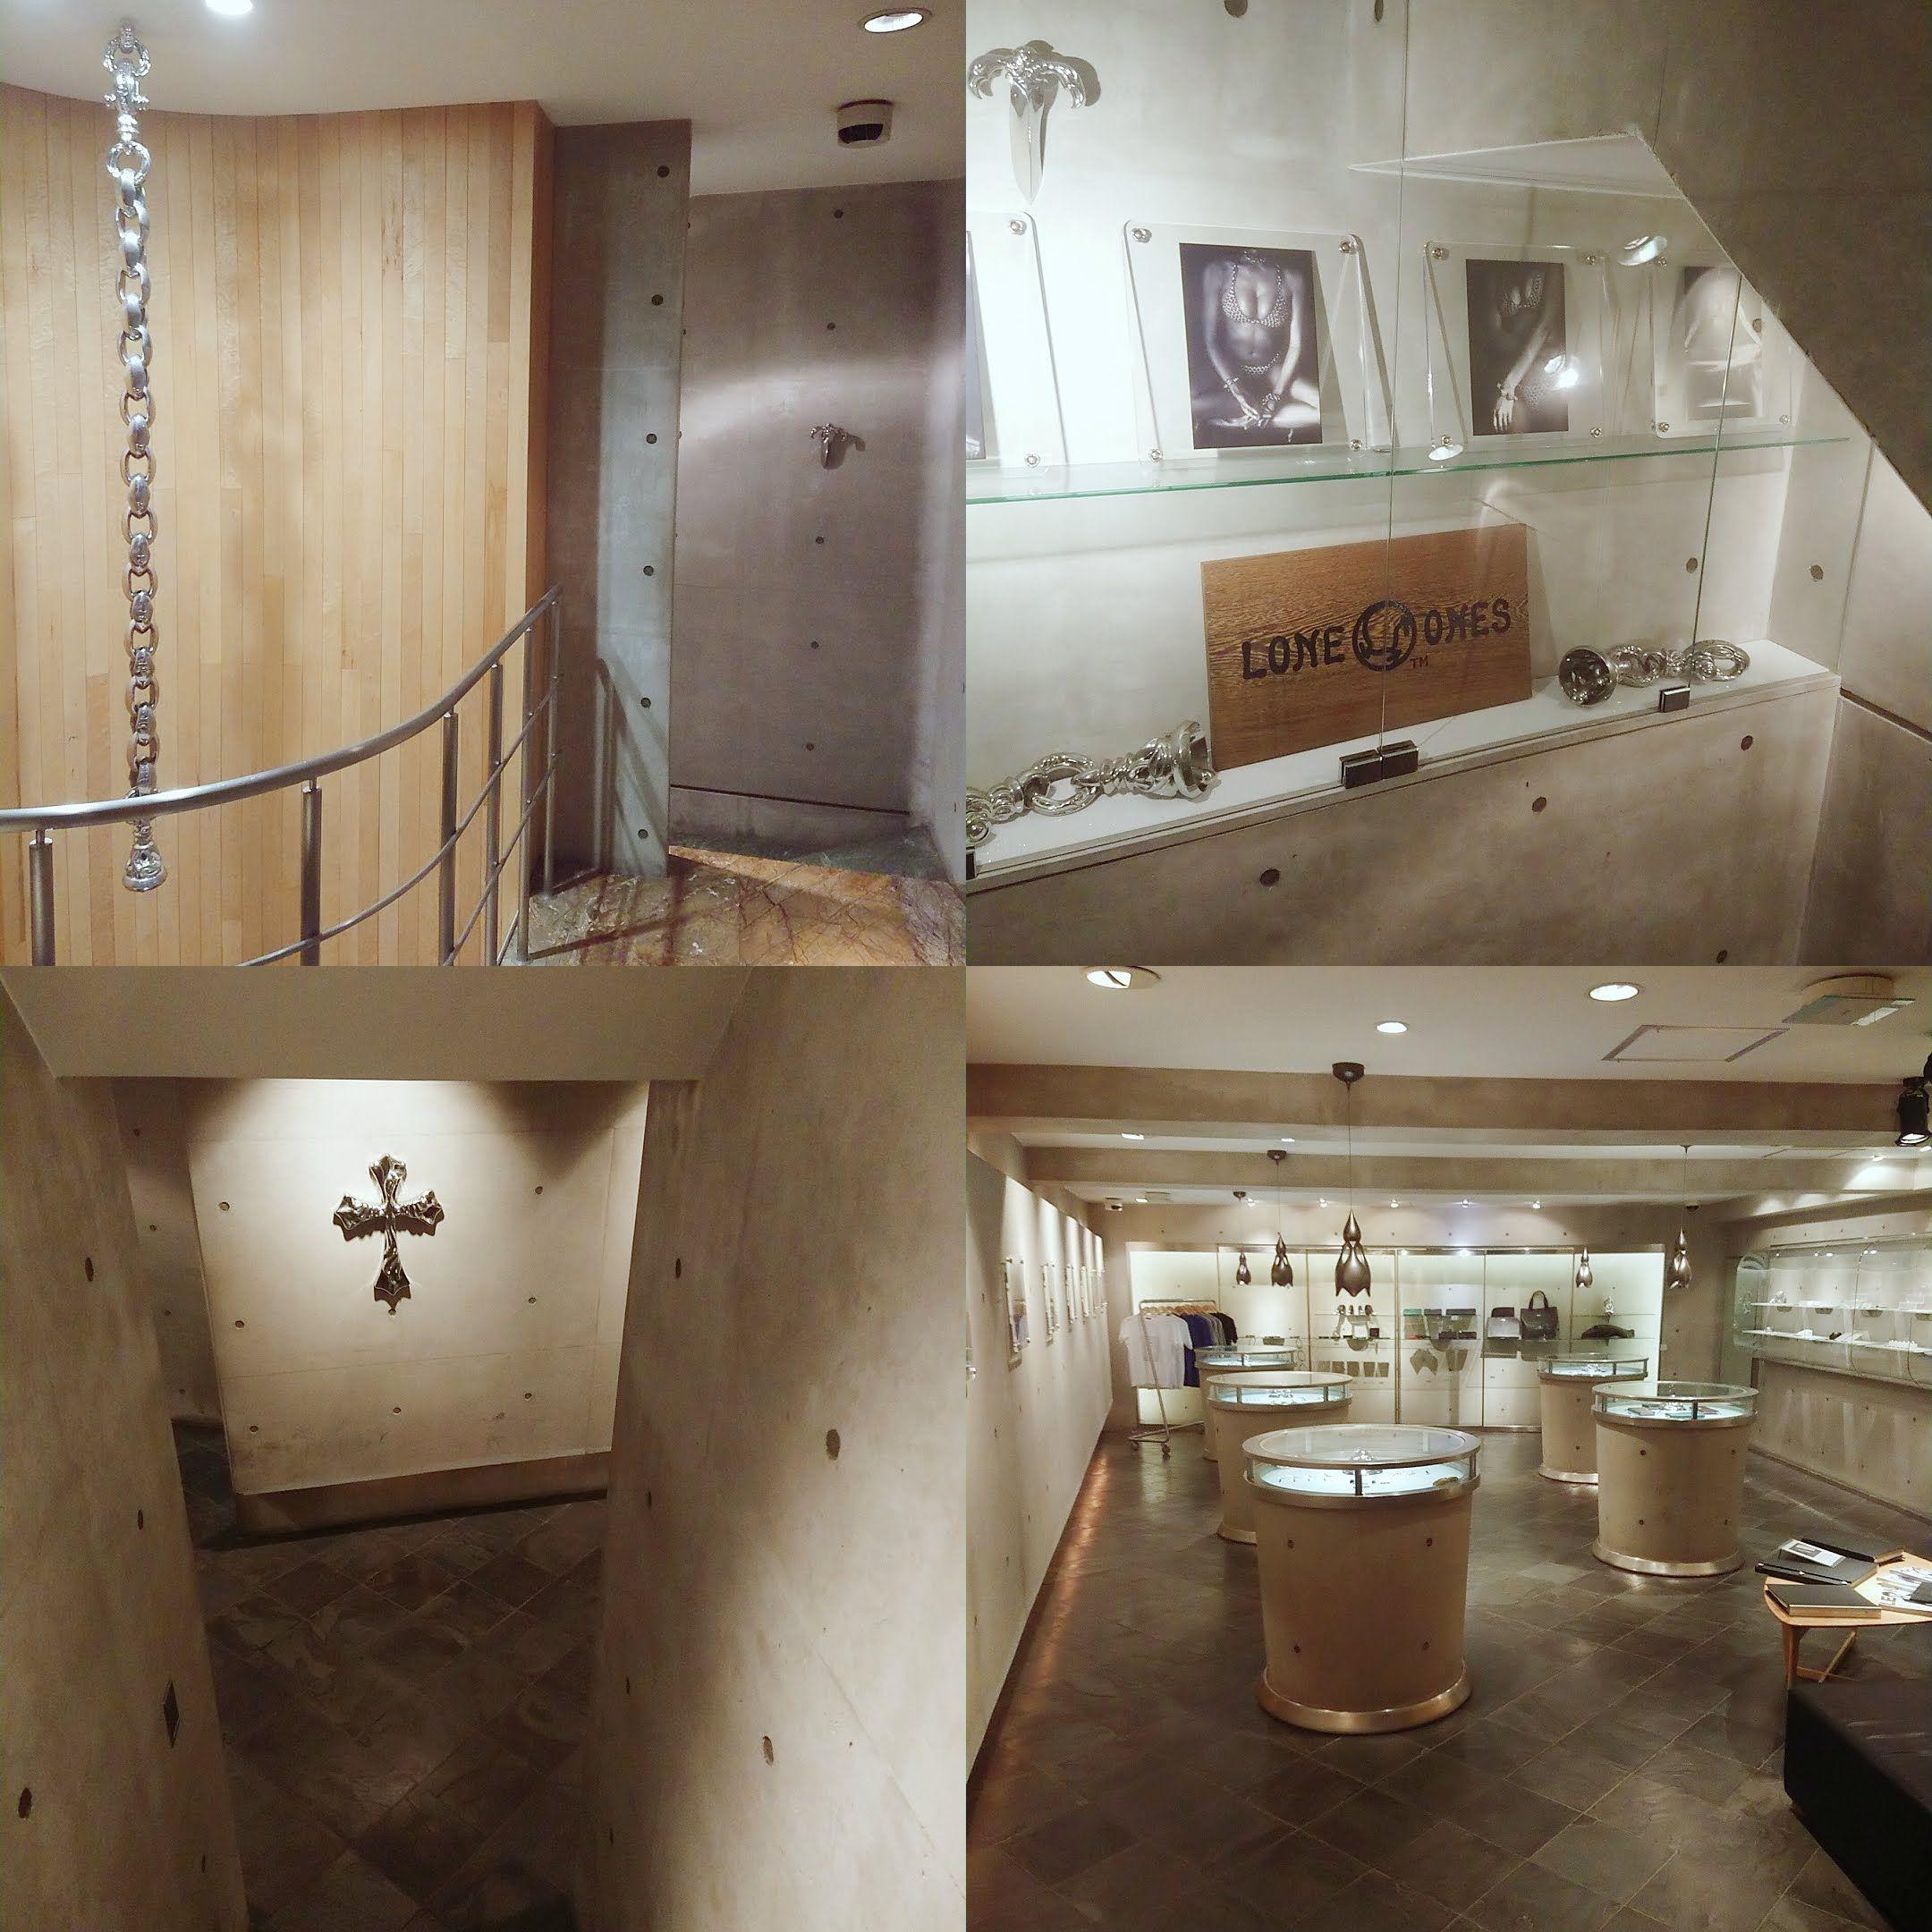 Loneones Aoyama Flagship Shop ロンワンズ青山 150 0001 東京